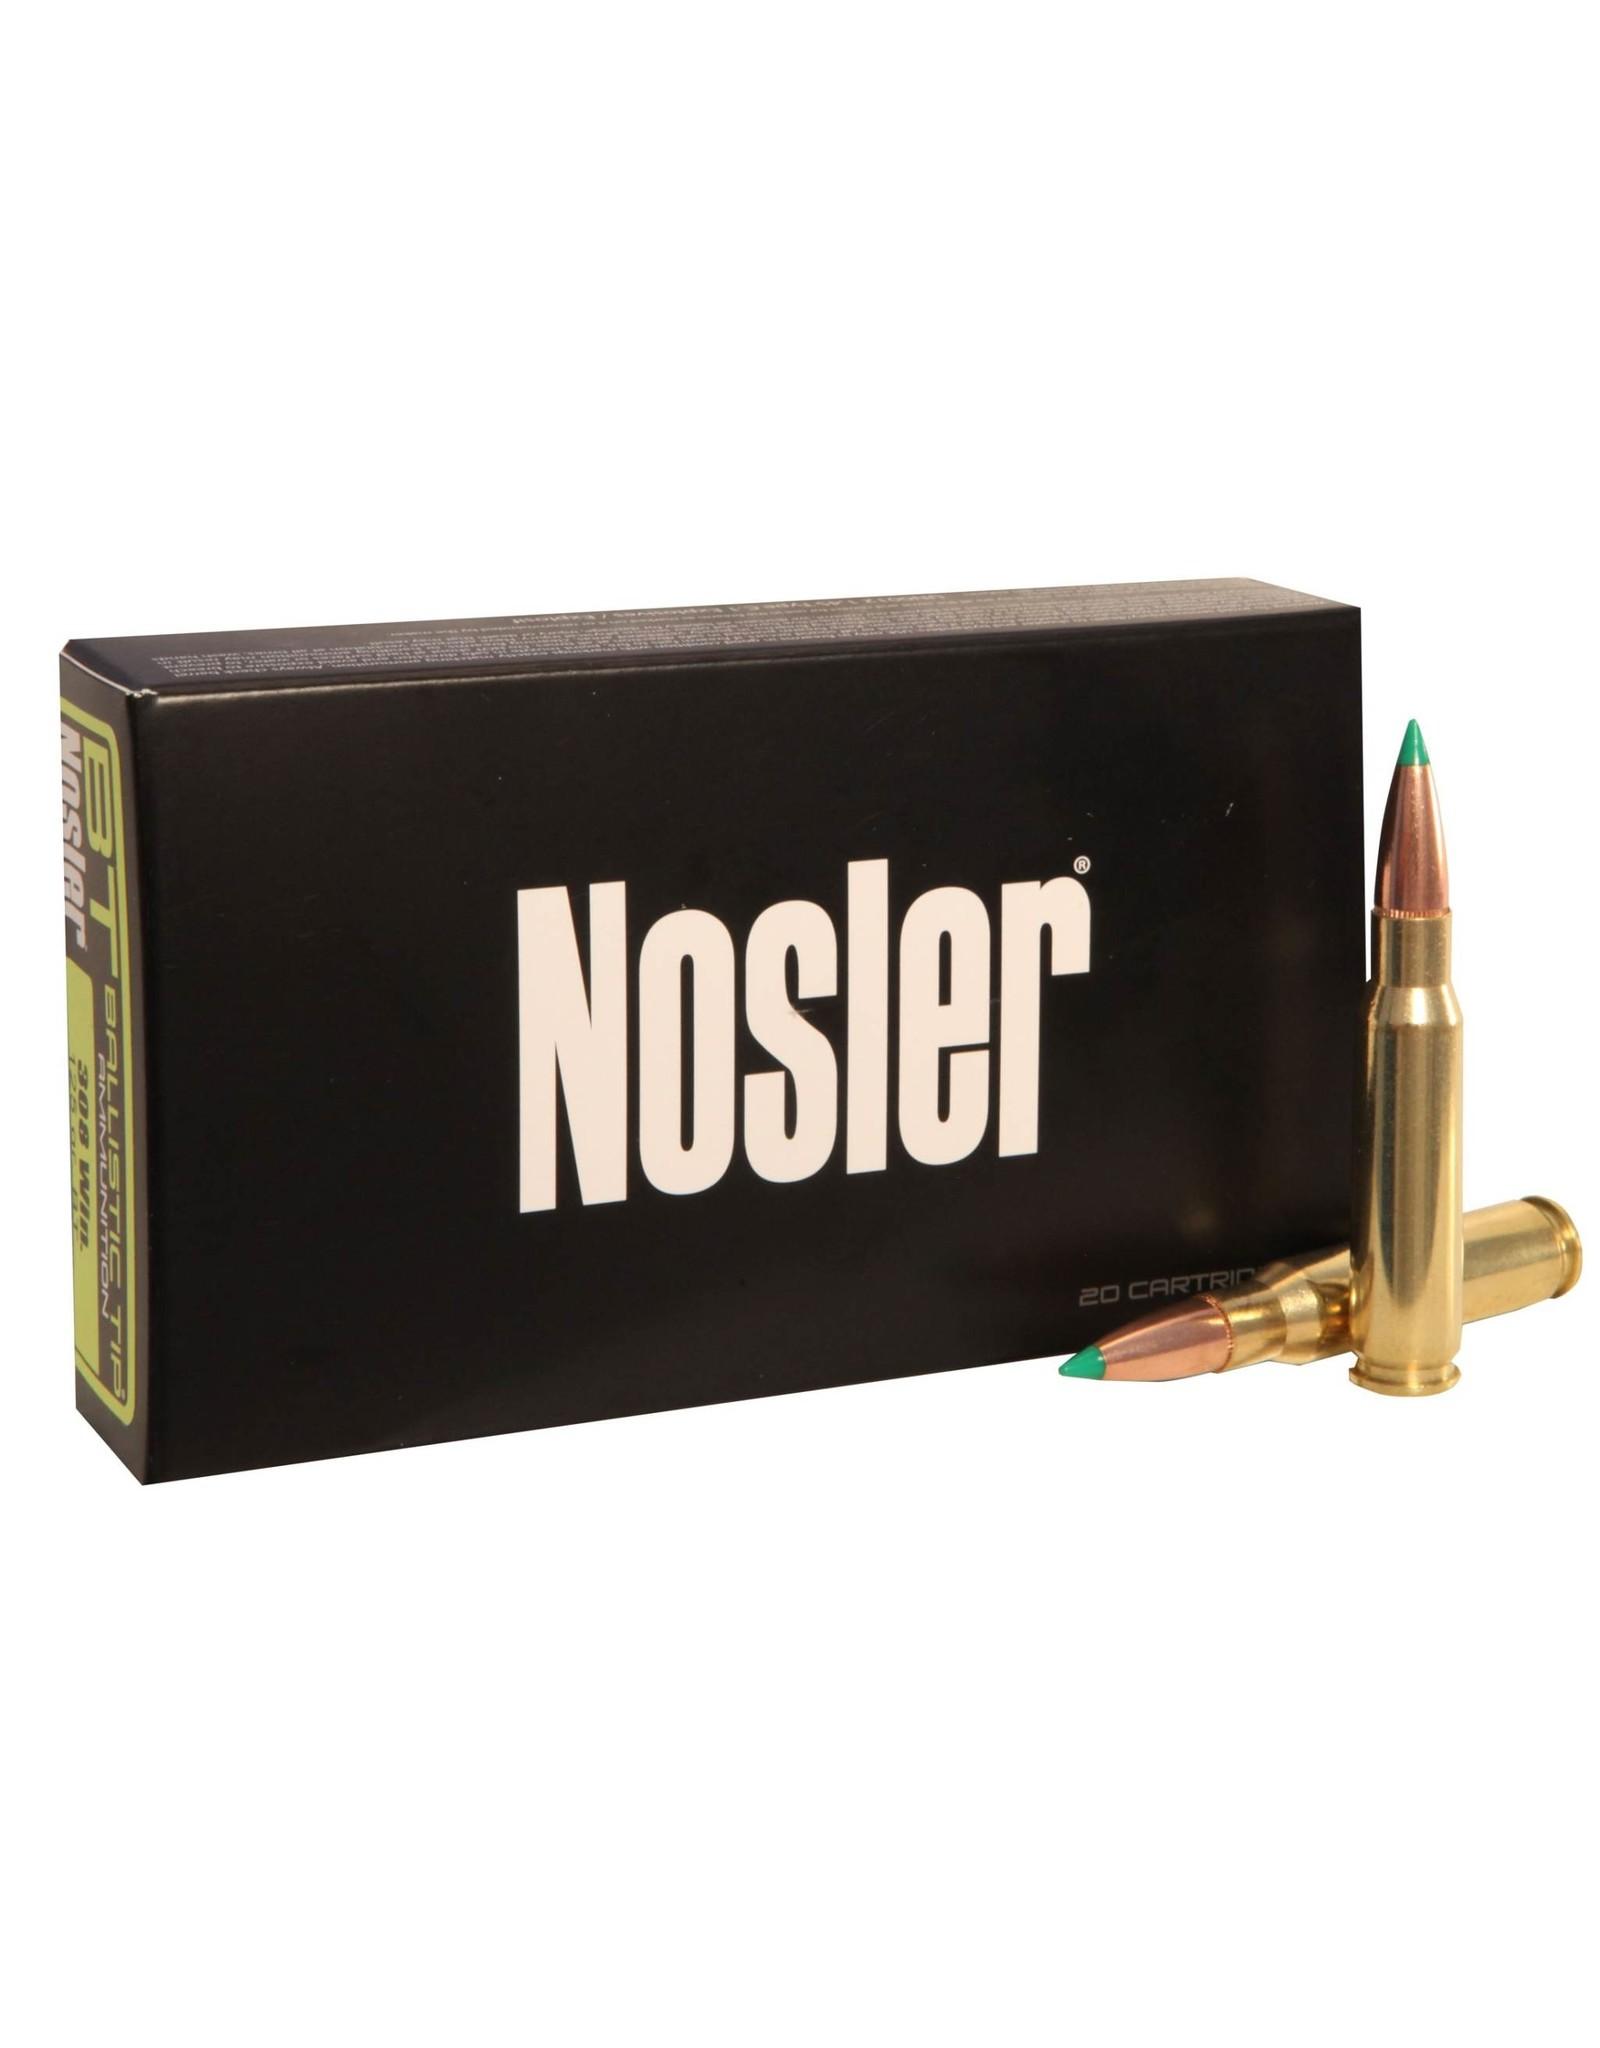 Nosler Nosler - 308 Win - 165gr BallisticTip - 20ct